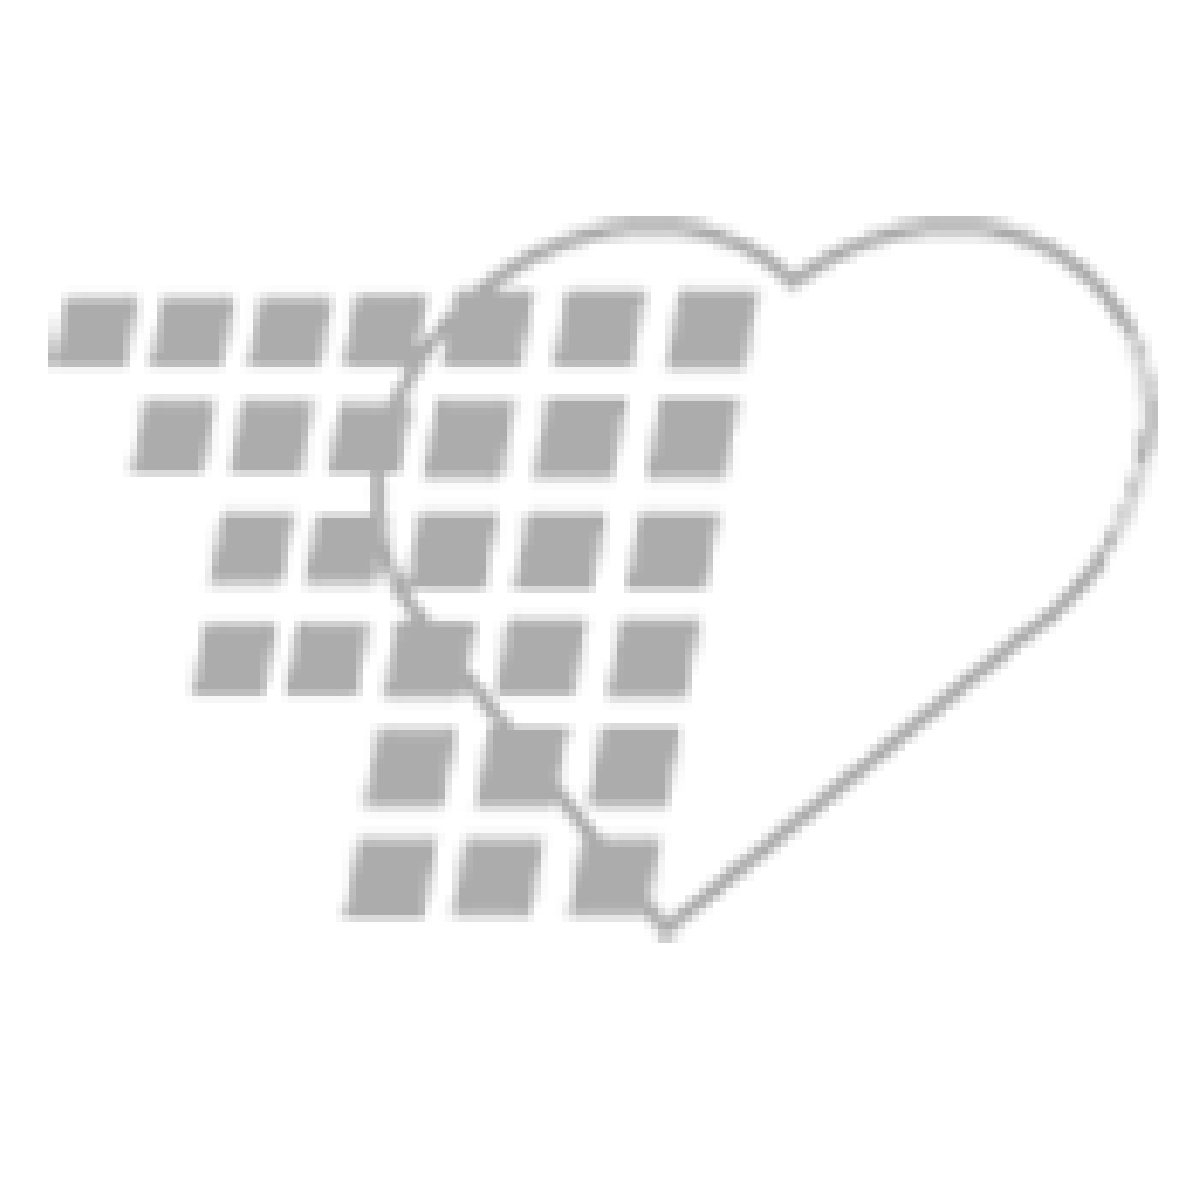 05-23-1213 - Graham-Field Cane Alum Adjust Vinyl Grip